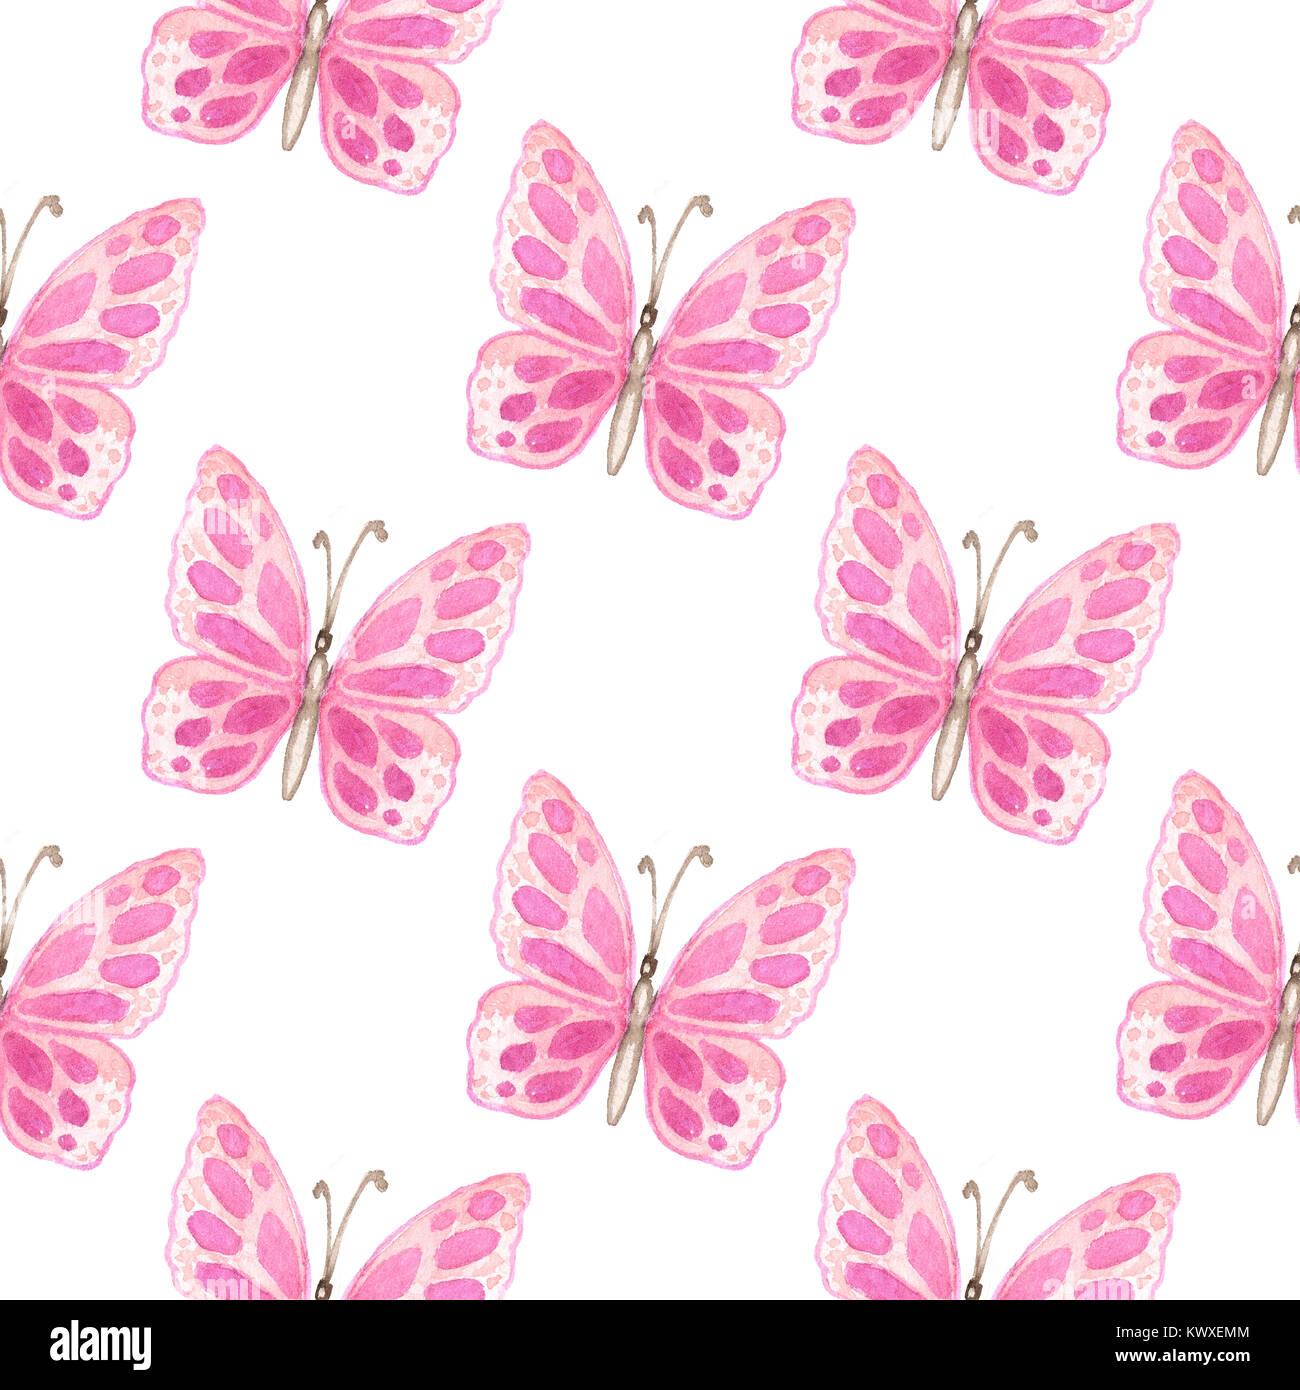 Disegnata A Mano Ad Acquerello Modello Senza Cuciture Con Farfalle